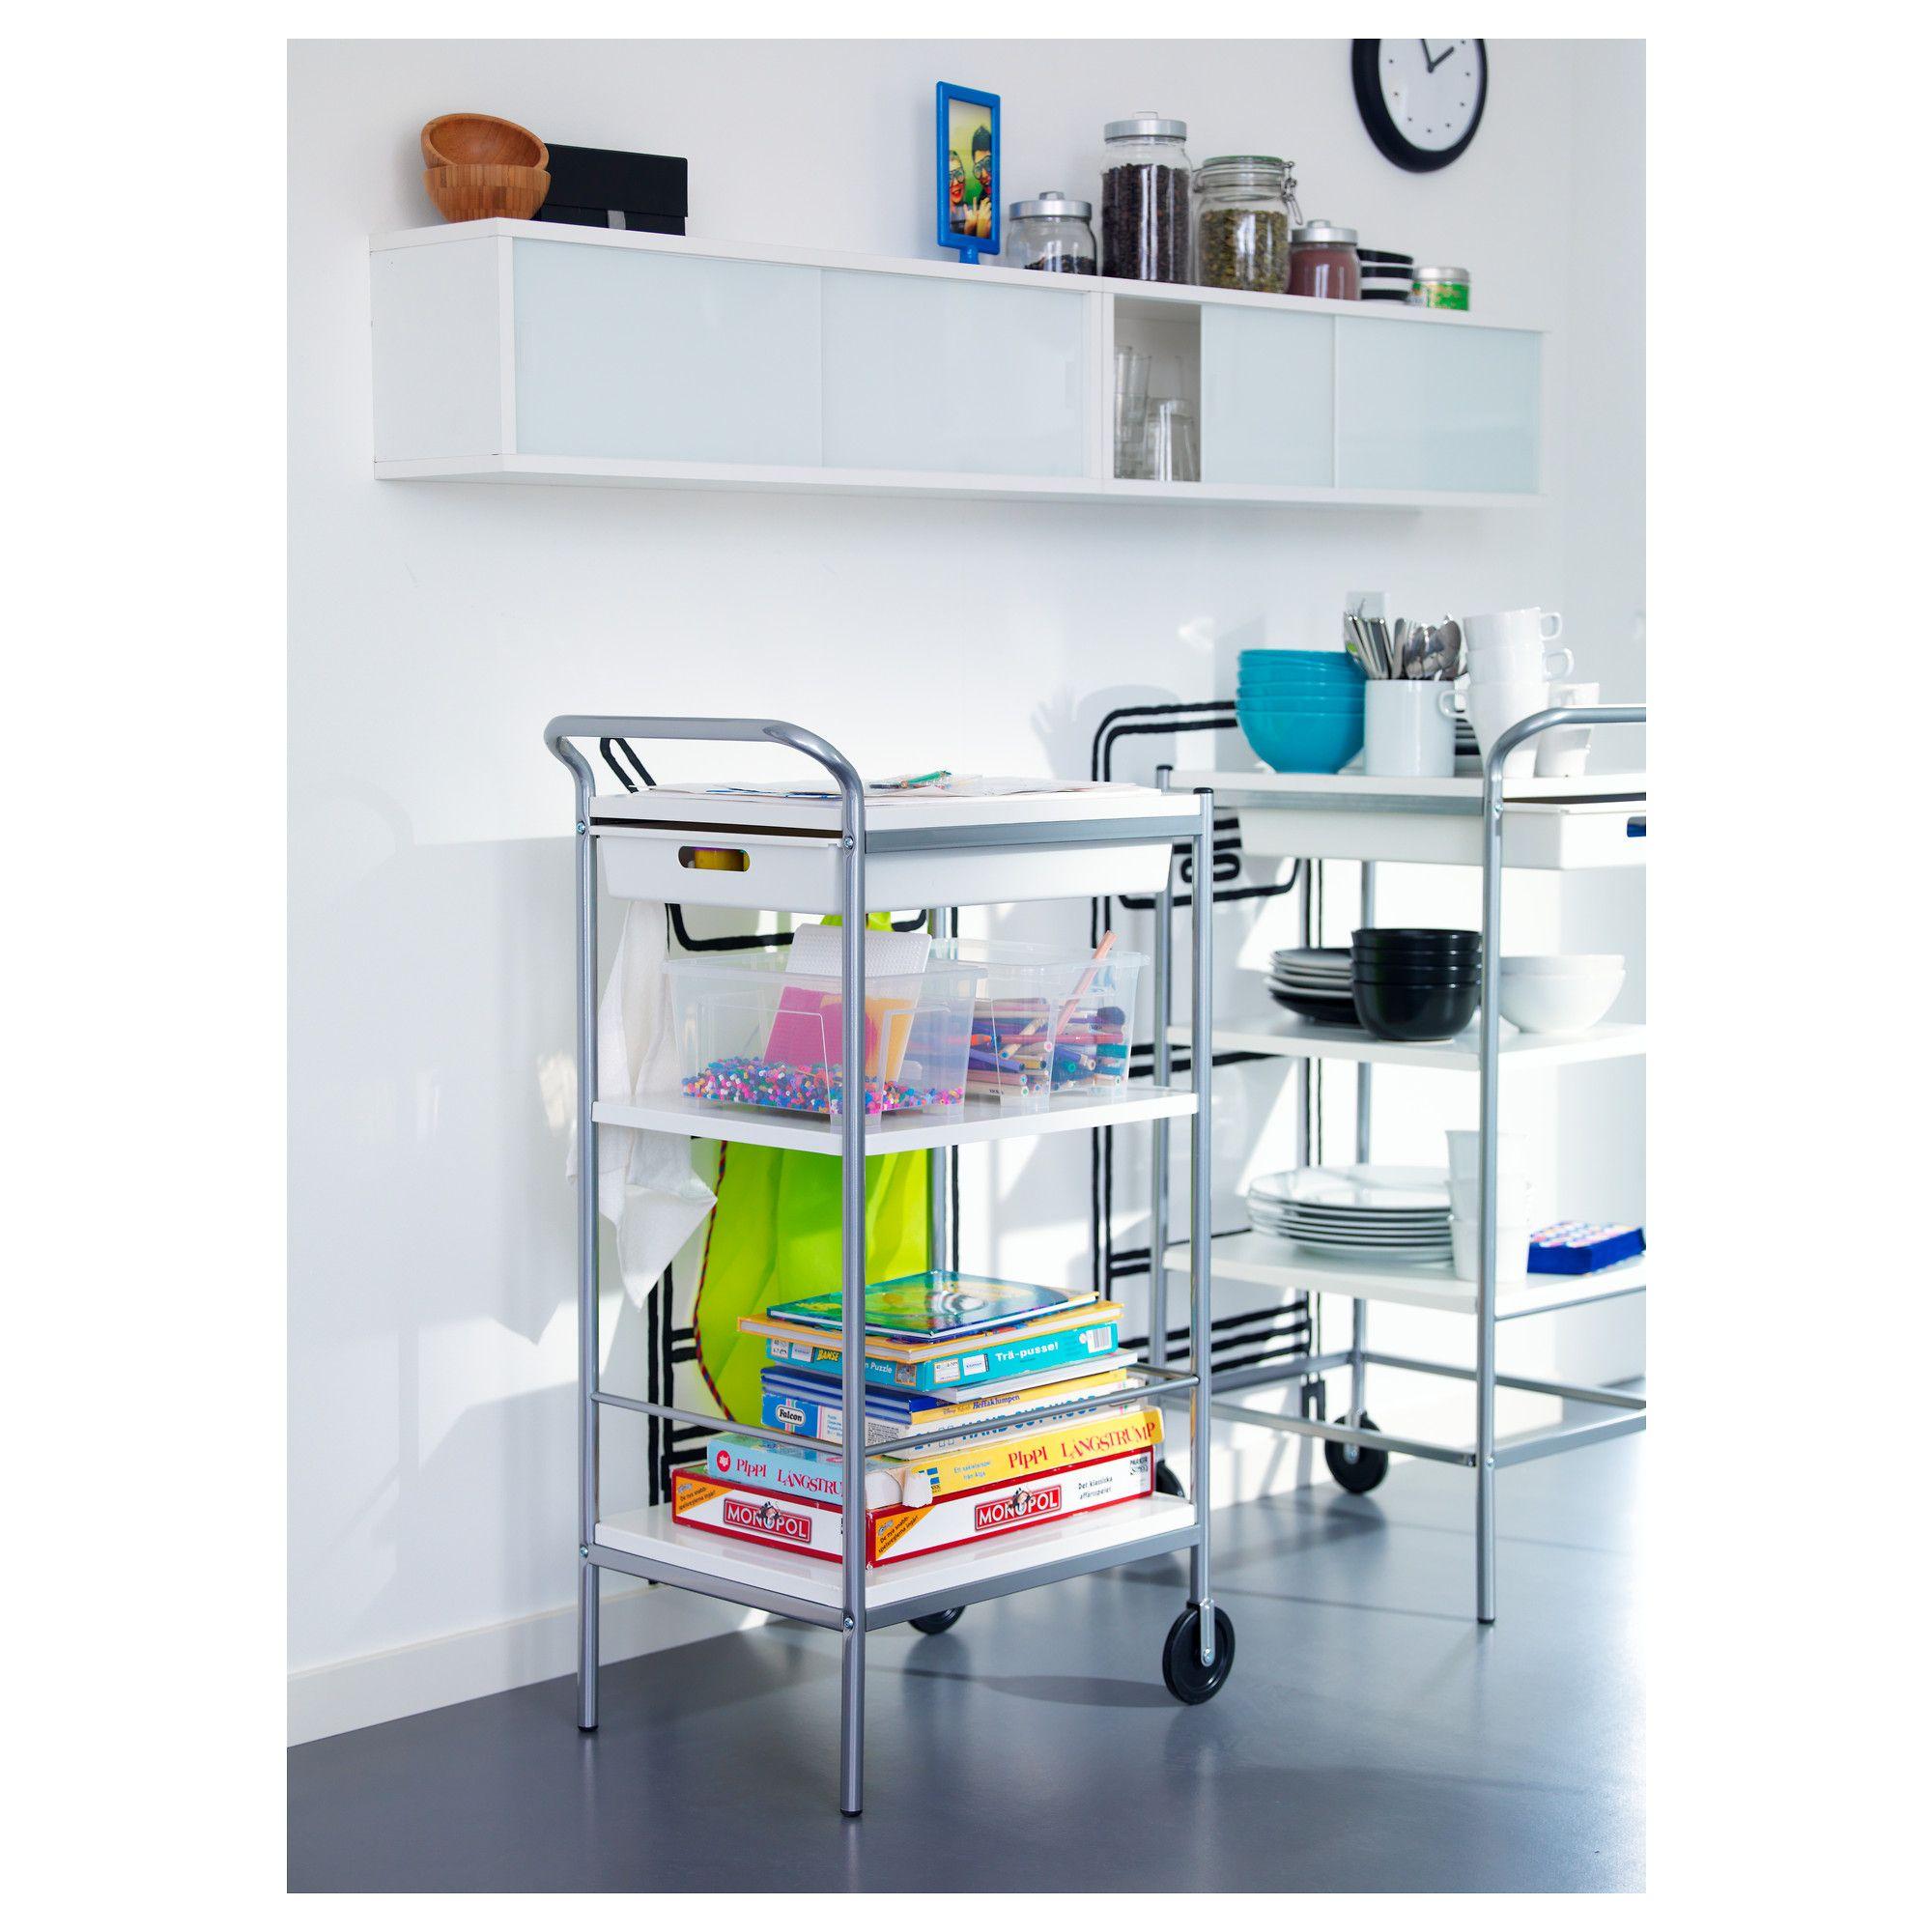 Sthamra Wandschrank Mit 2 Vitrinent Ren Ikea 29 90 I 3 Ikea  # Mueble Toallero Ikea